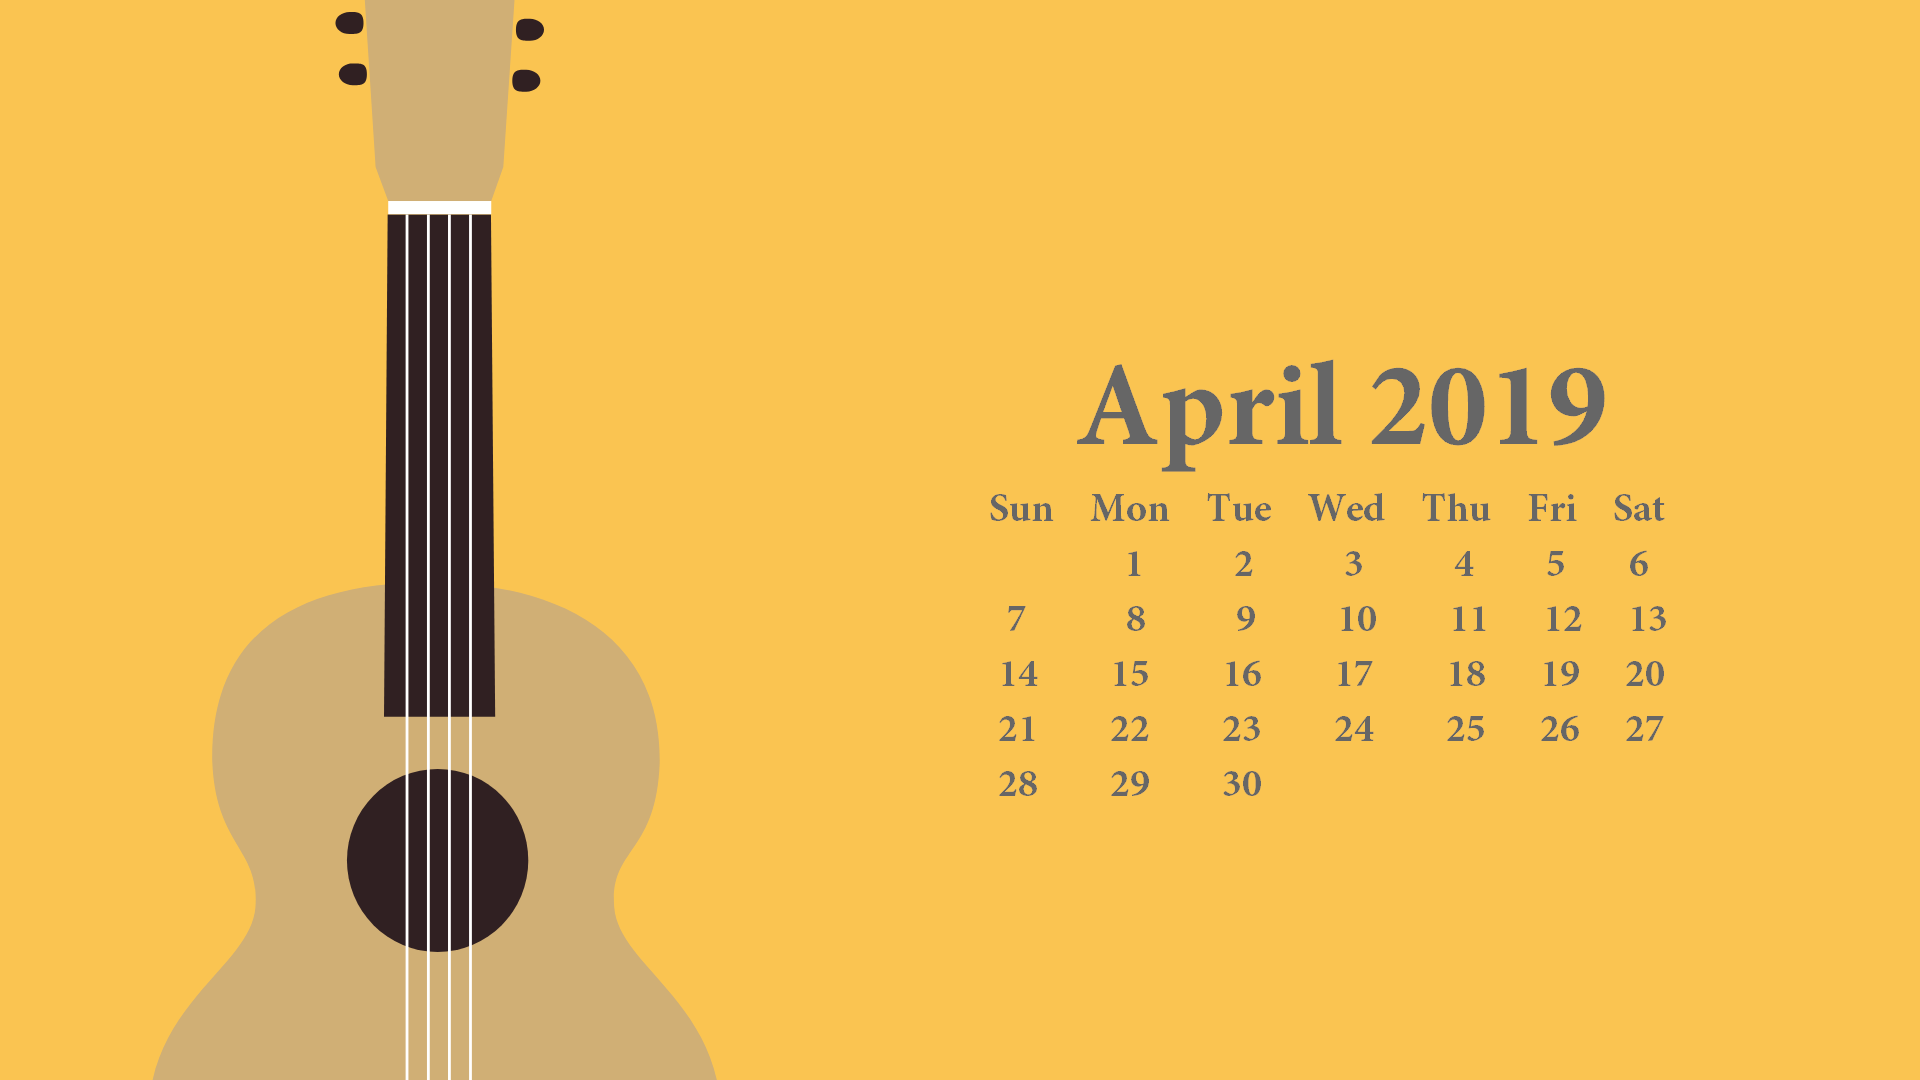 April 2019 Desktop Wallpaper With Calendar